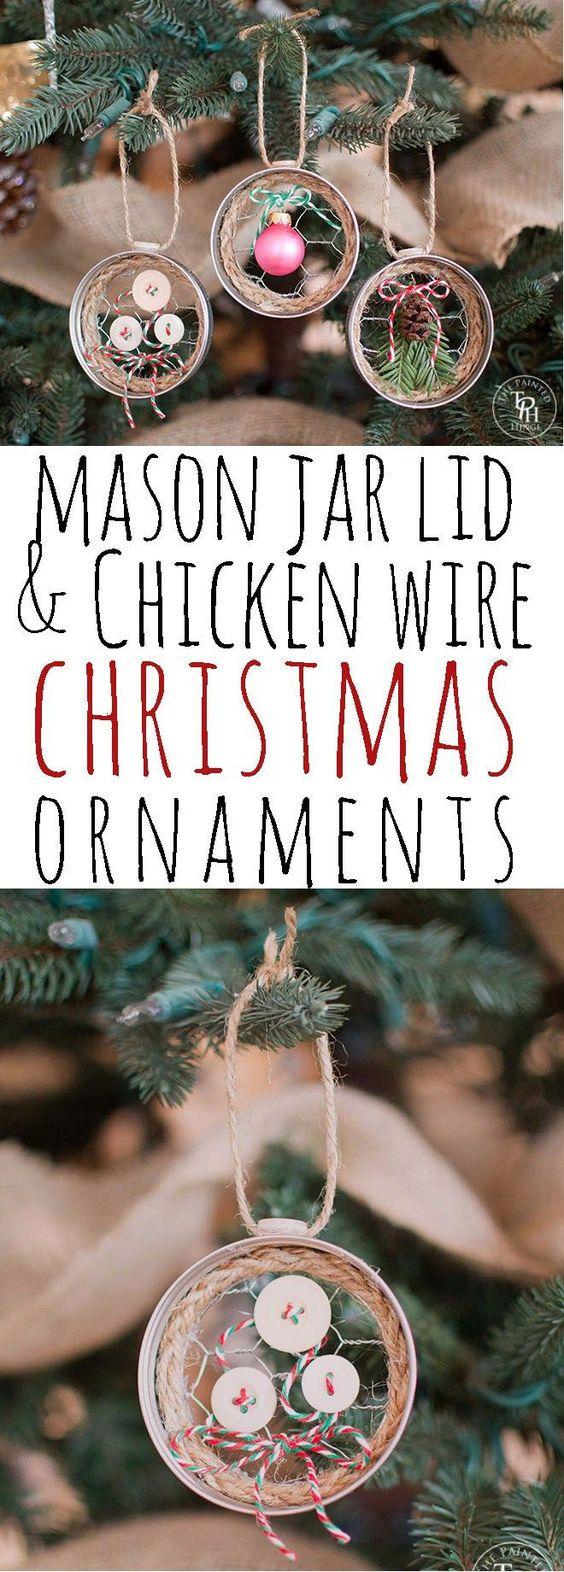 Mason Jar Lid & Chicken Wire Christmas Ornaments.